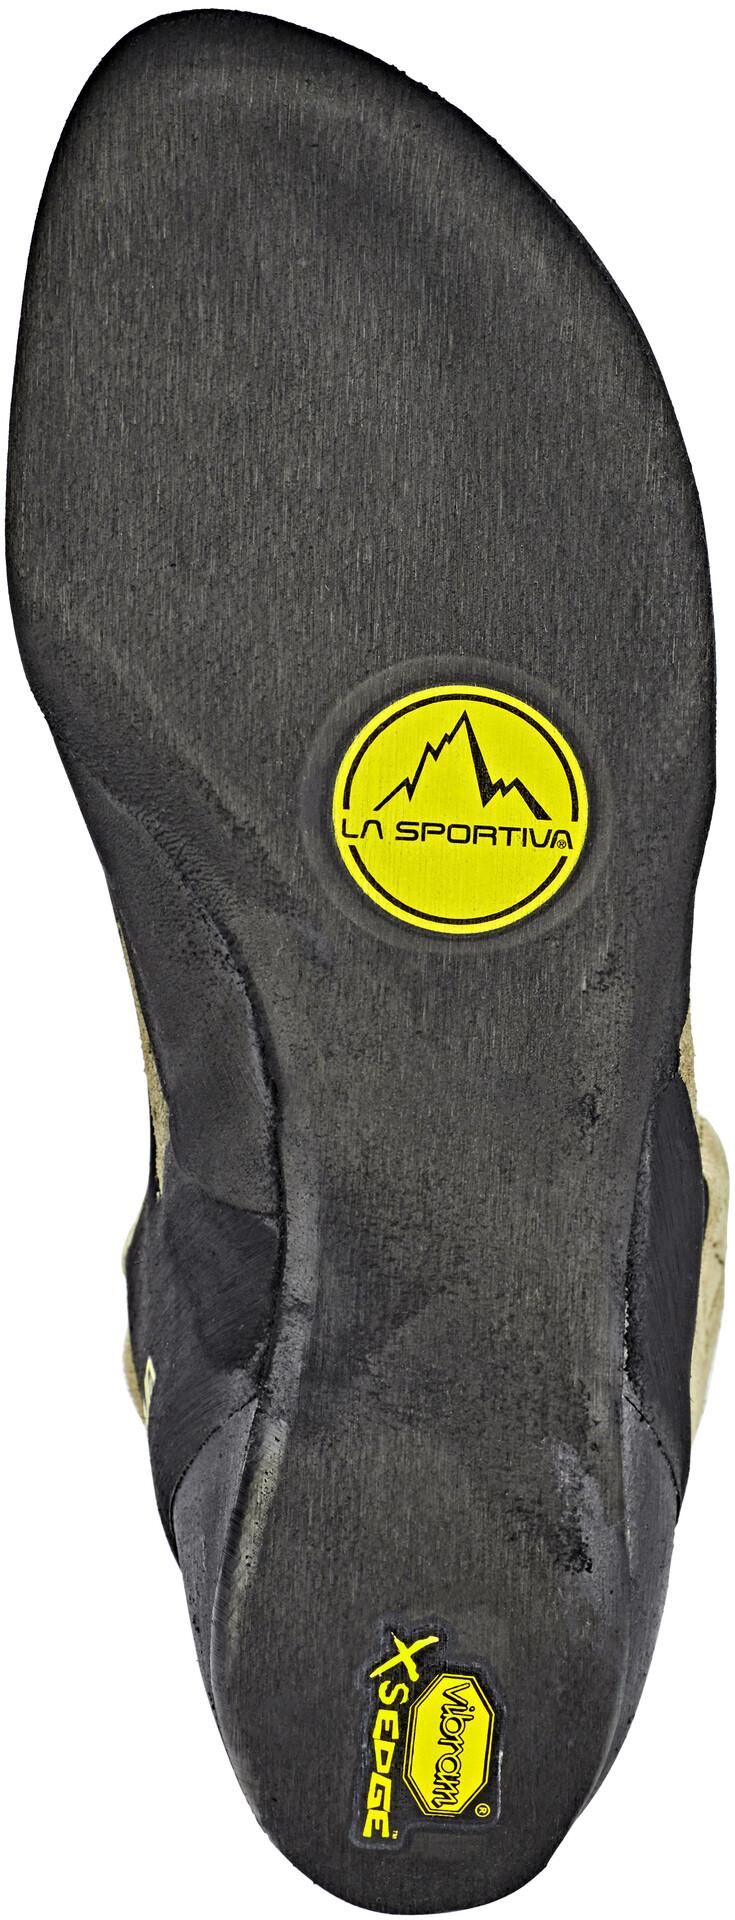 La Sportiva TC Pro Scarpe da arrampicata, sage su Addnature mNiYf